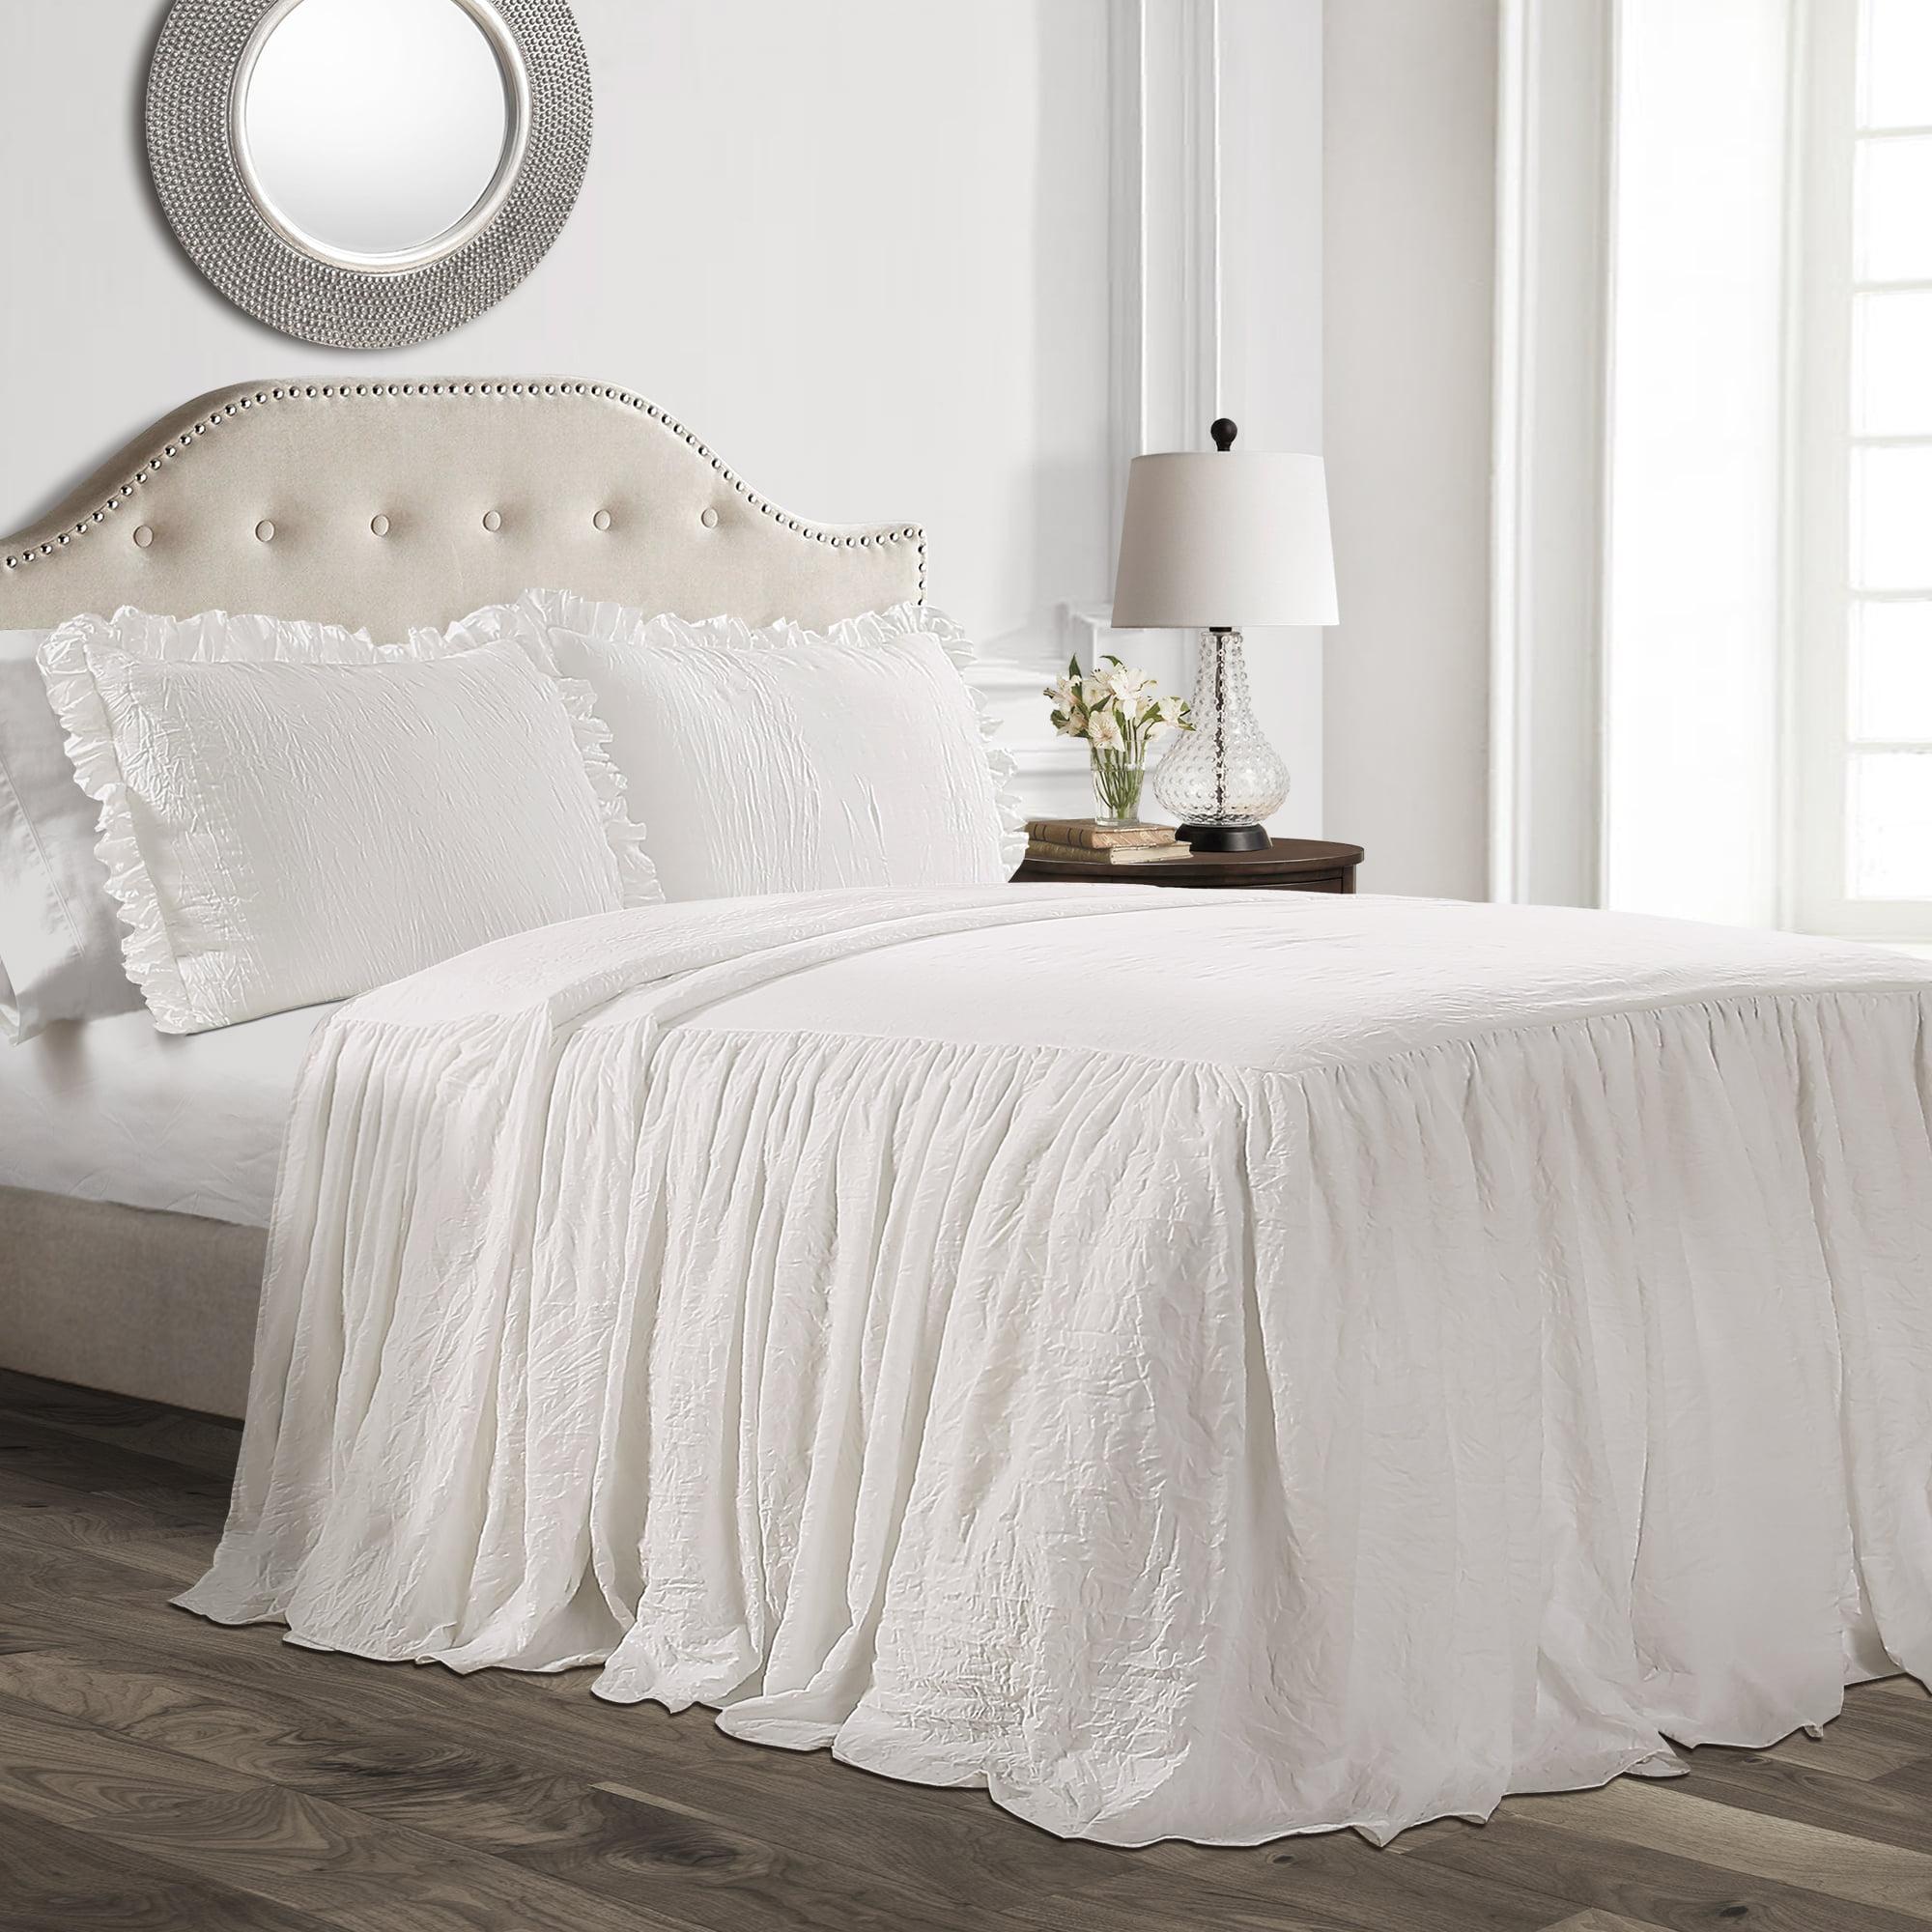 Lush Decor Ruffle Skirt 3 Piece White Bedspread Set Walmart Com Walmart Com